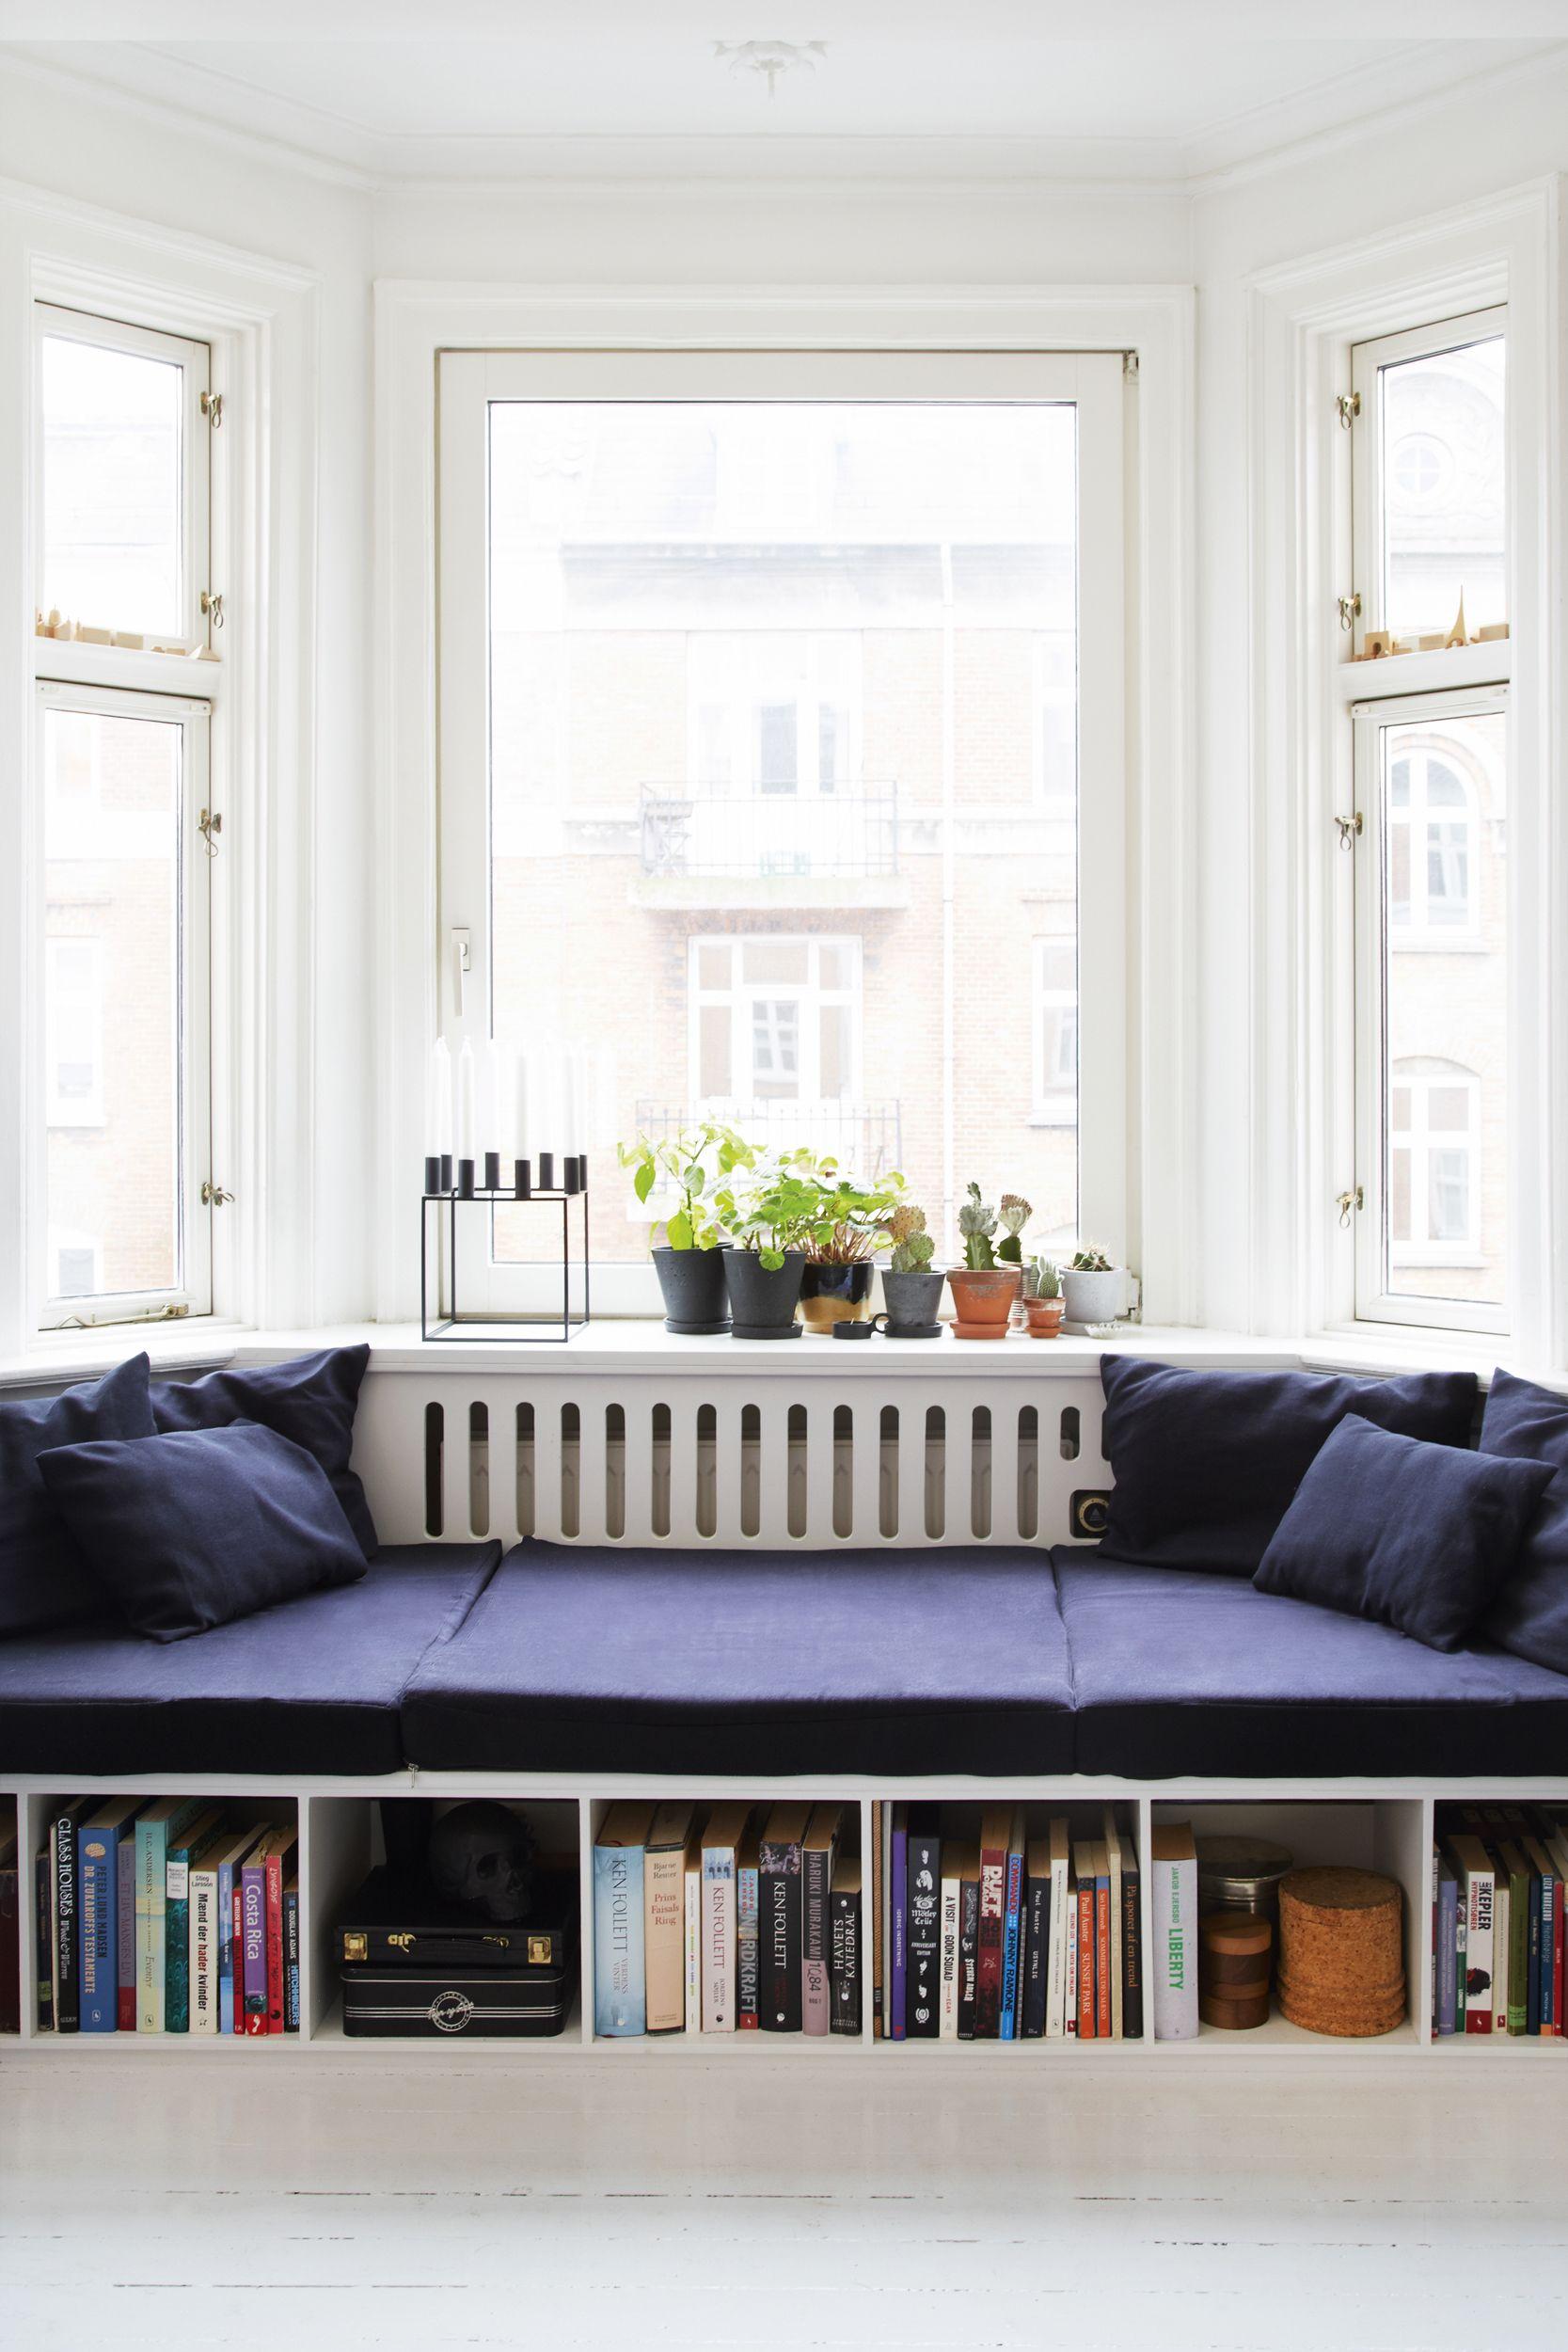 white wooden built in bench, dark blue cushion and pillows, white floor, white framed window